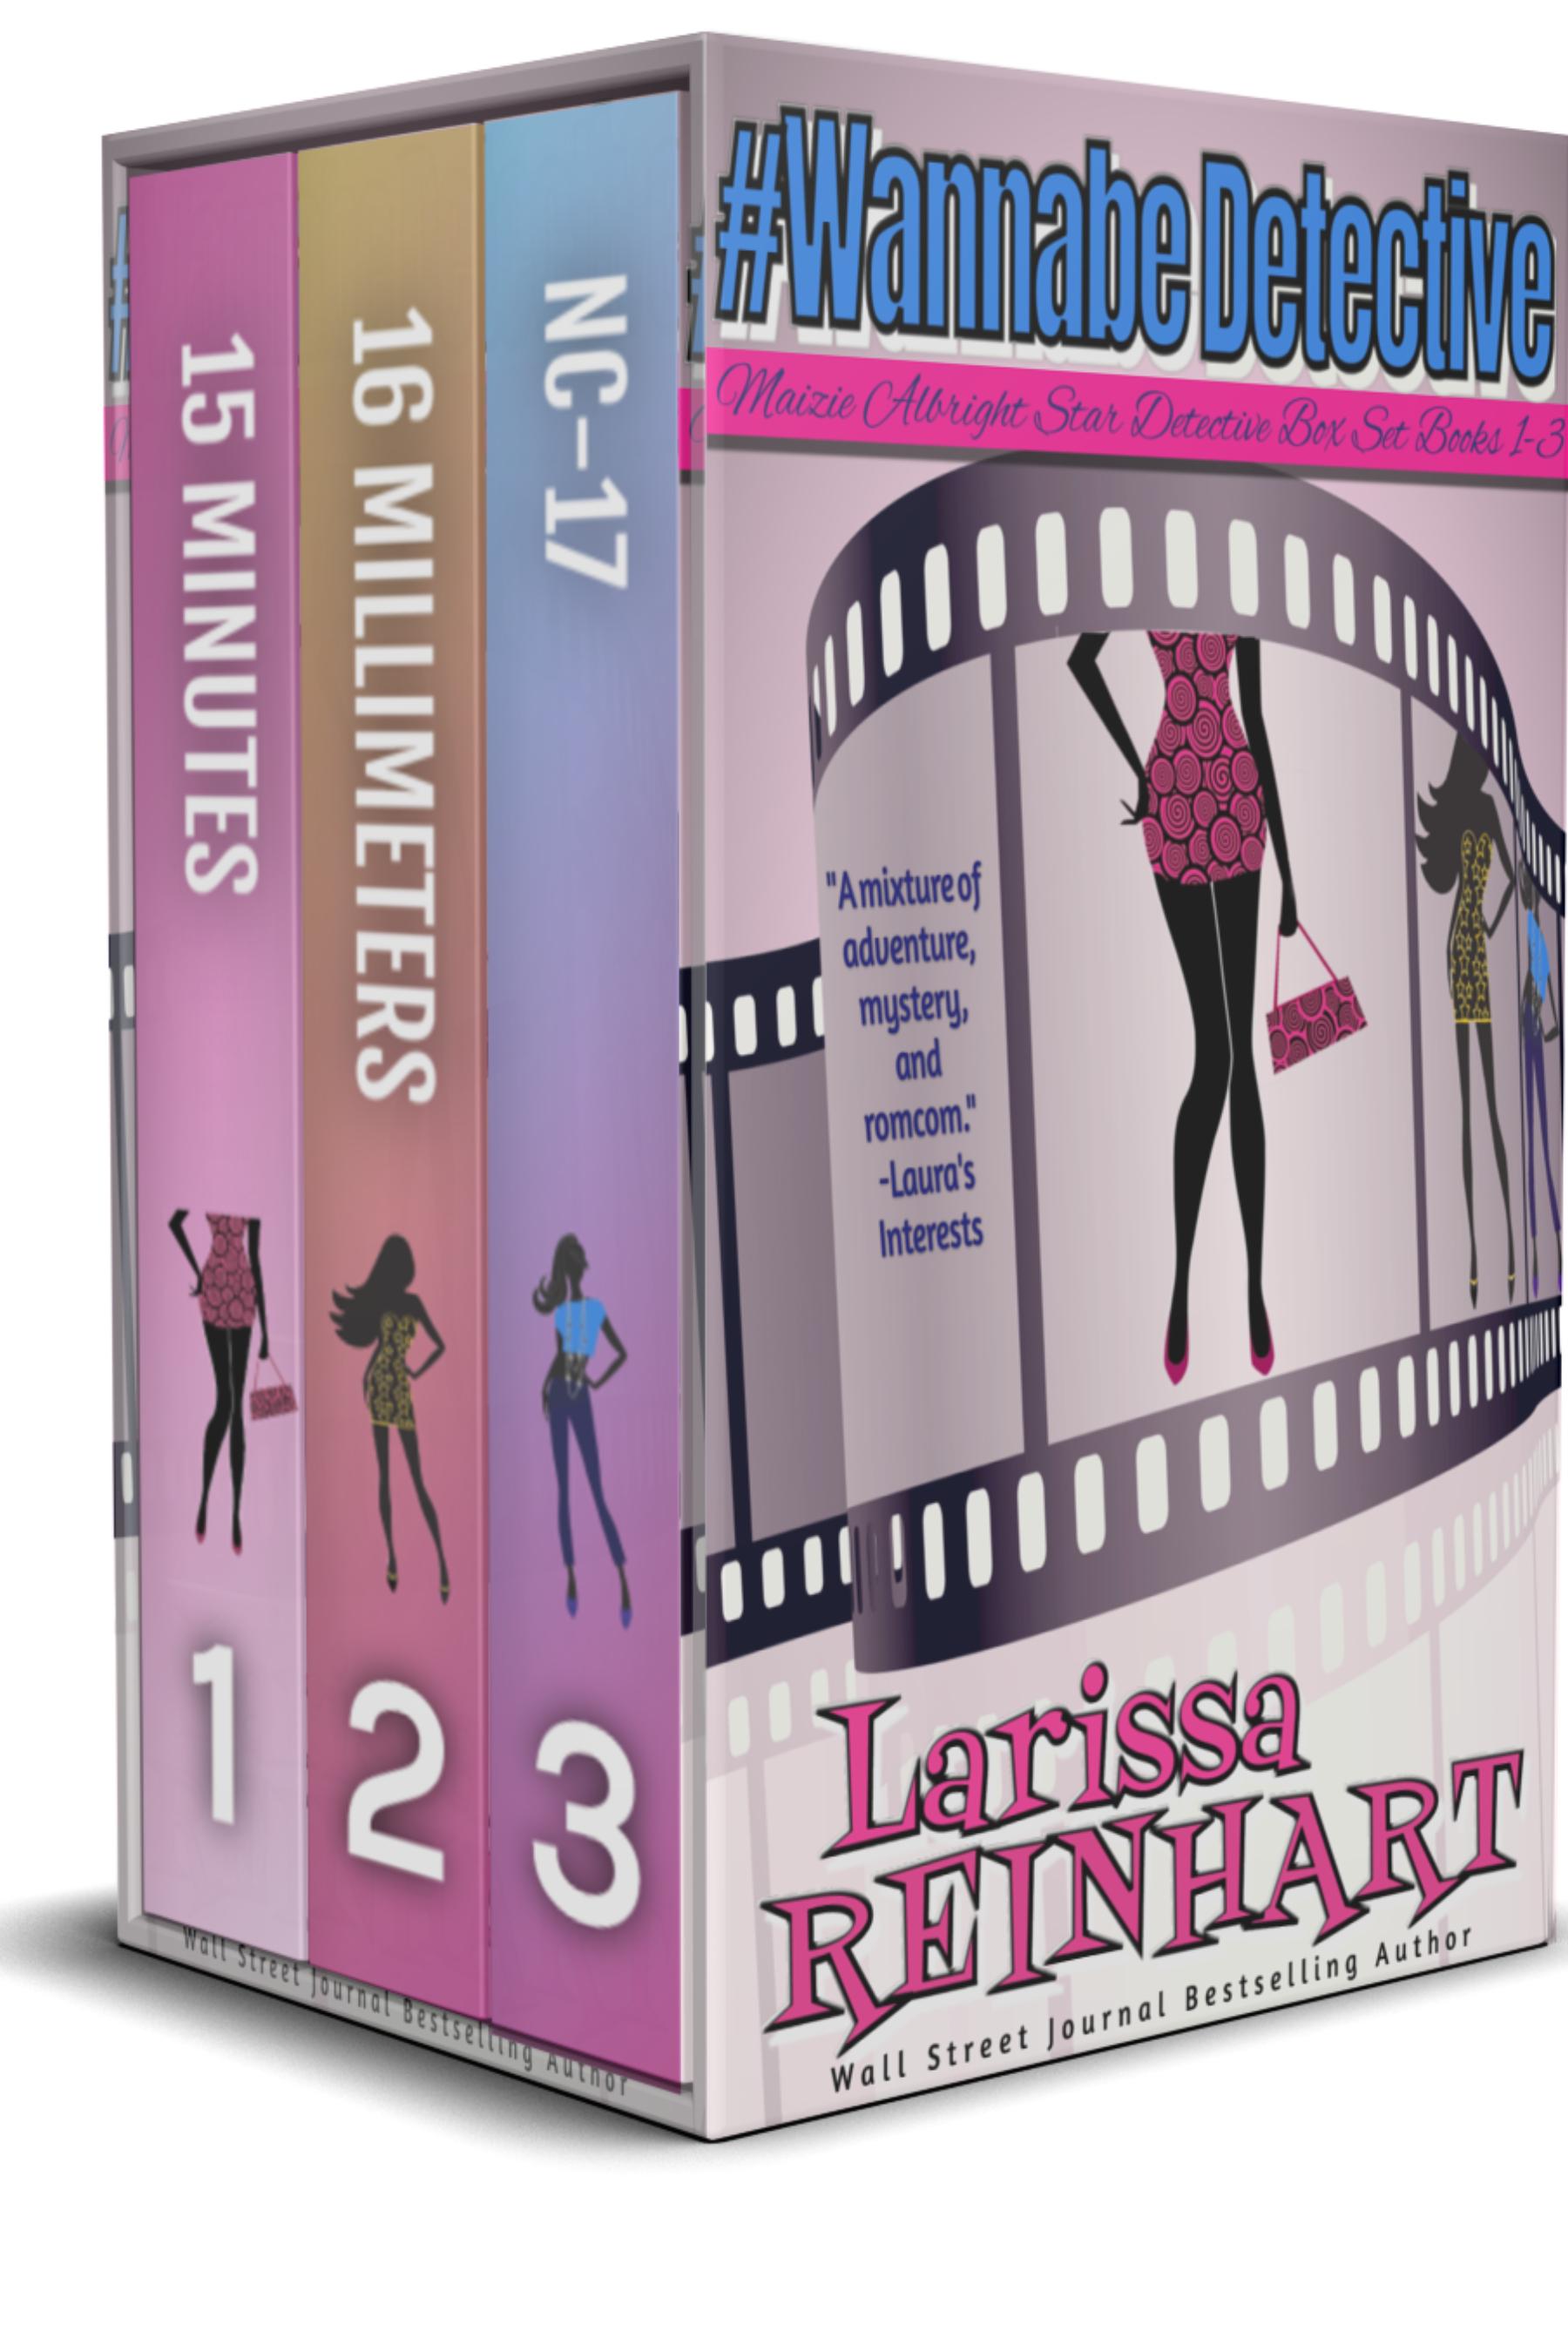 #WannabeDetective: Maizie Albright Star Detective box set